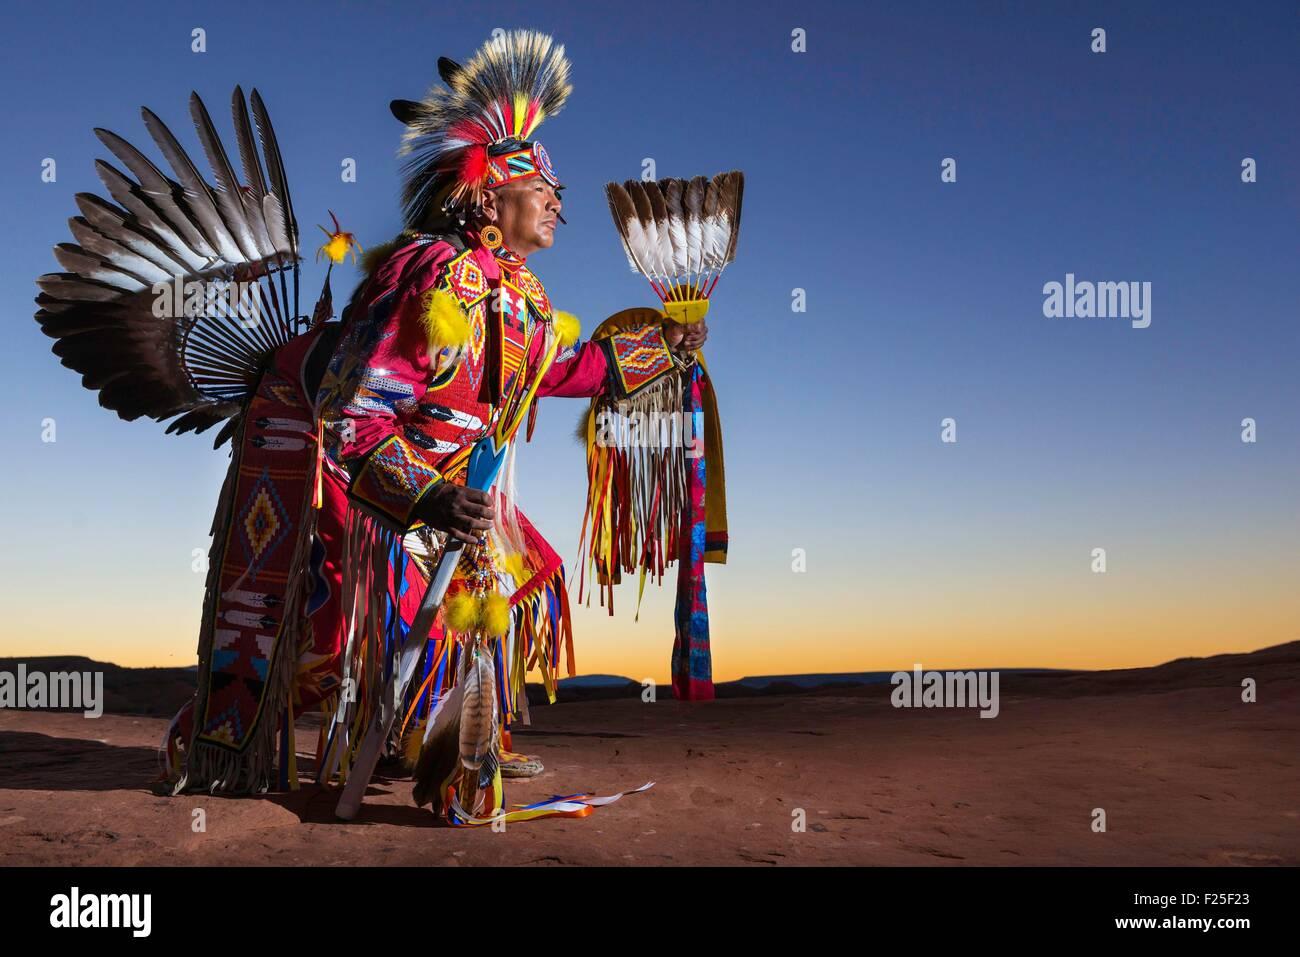 United States, Arizona, Monument Valley Navajo Tribal Park, Navajo Anderson Chee - Stock Image